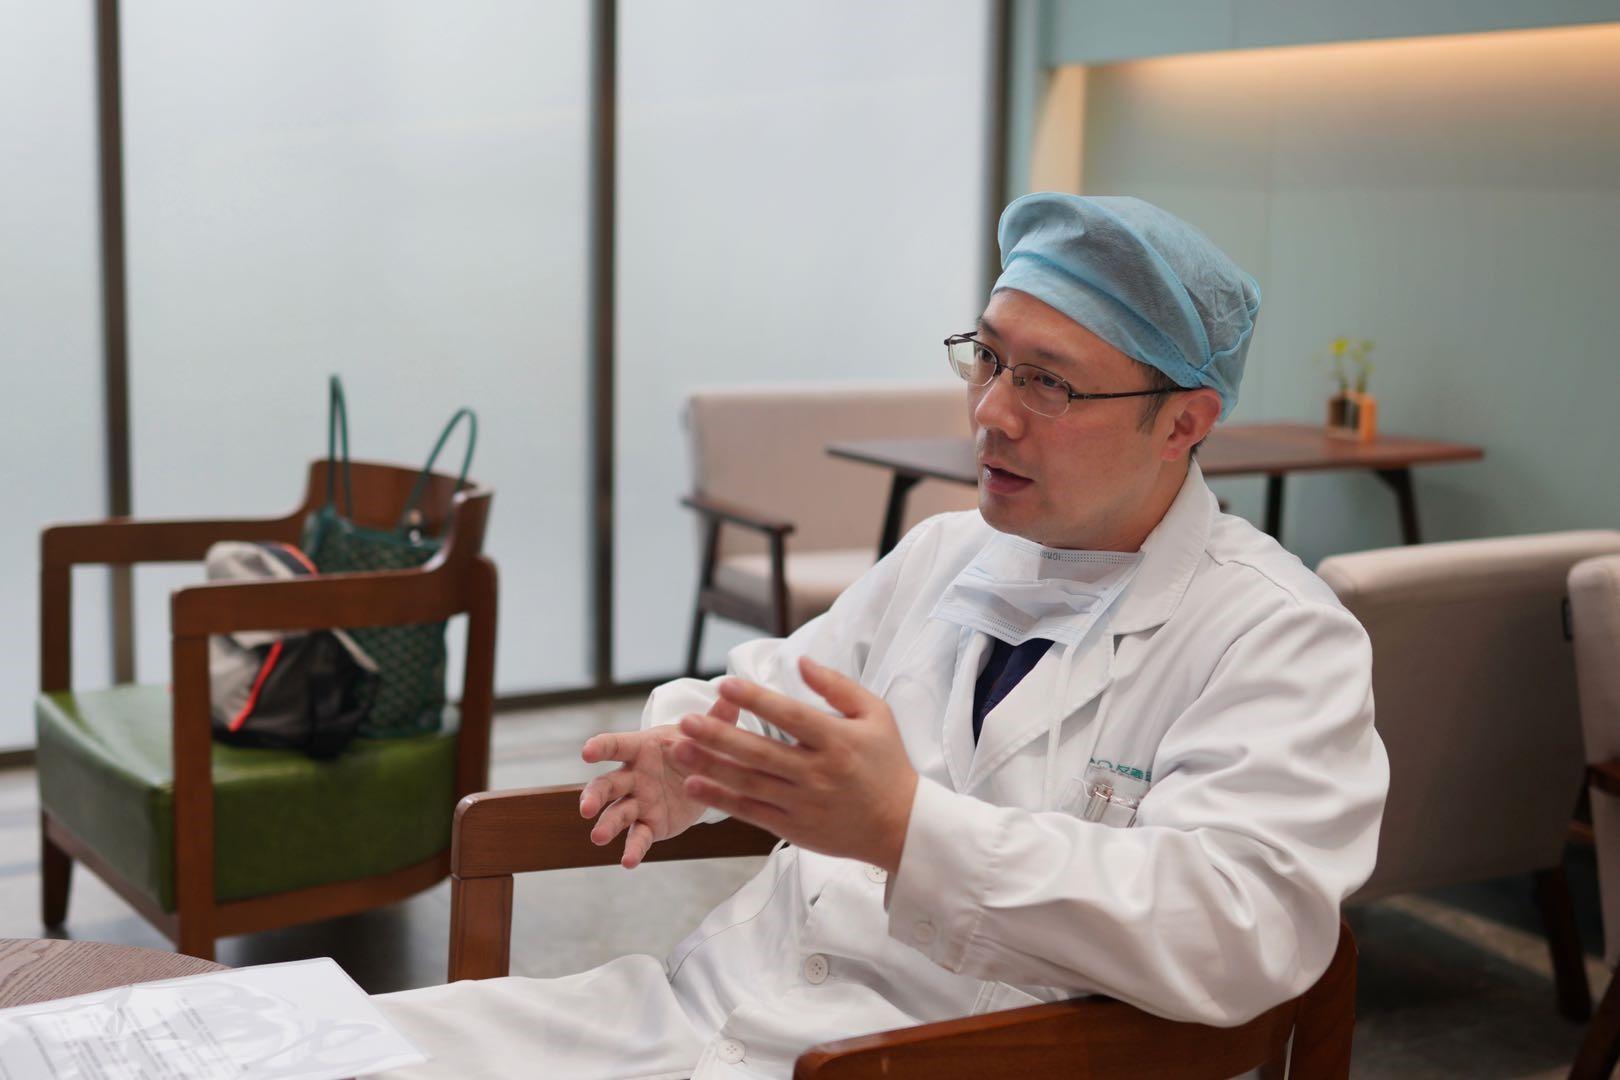 BDG冬雷脑科王威主任:以同理心对待每一位患者